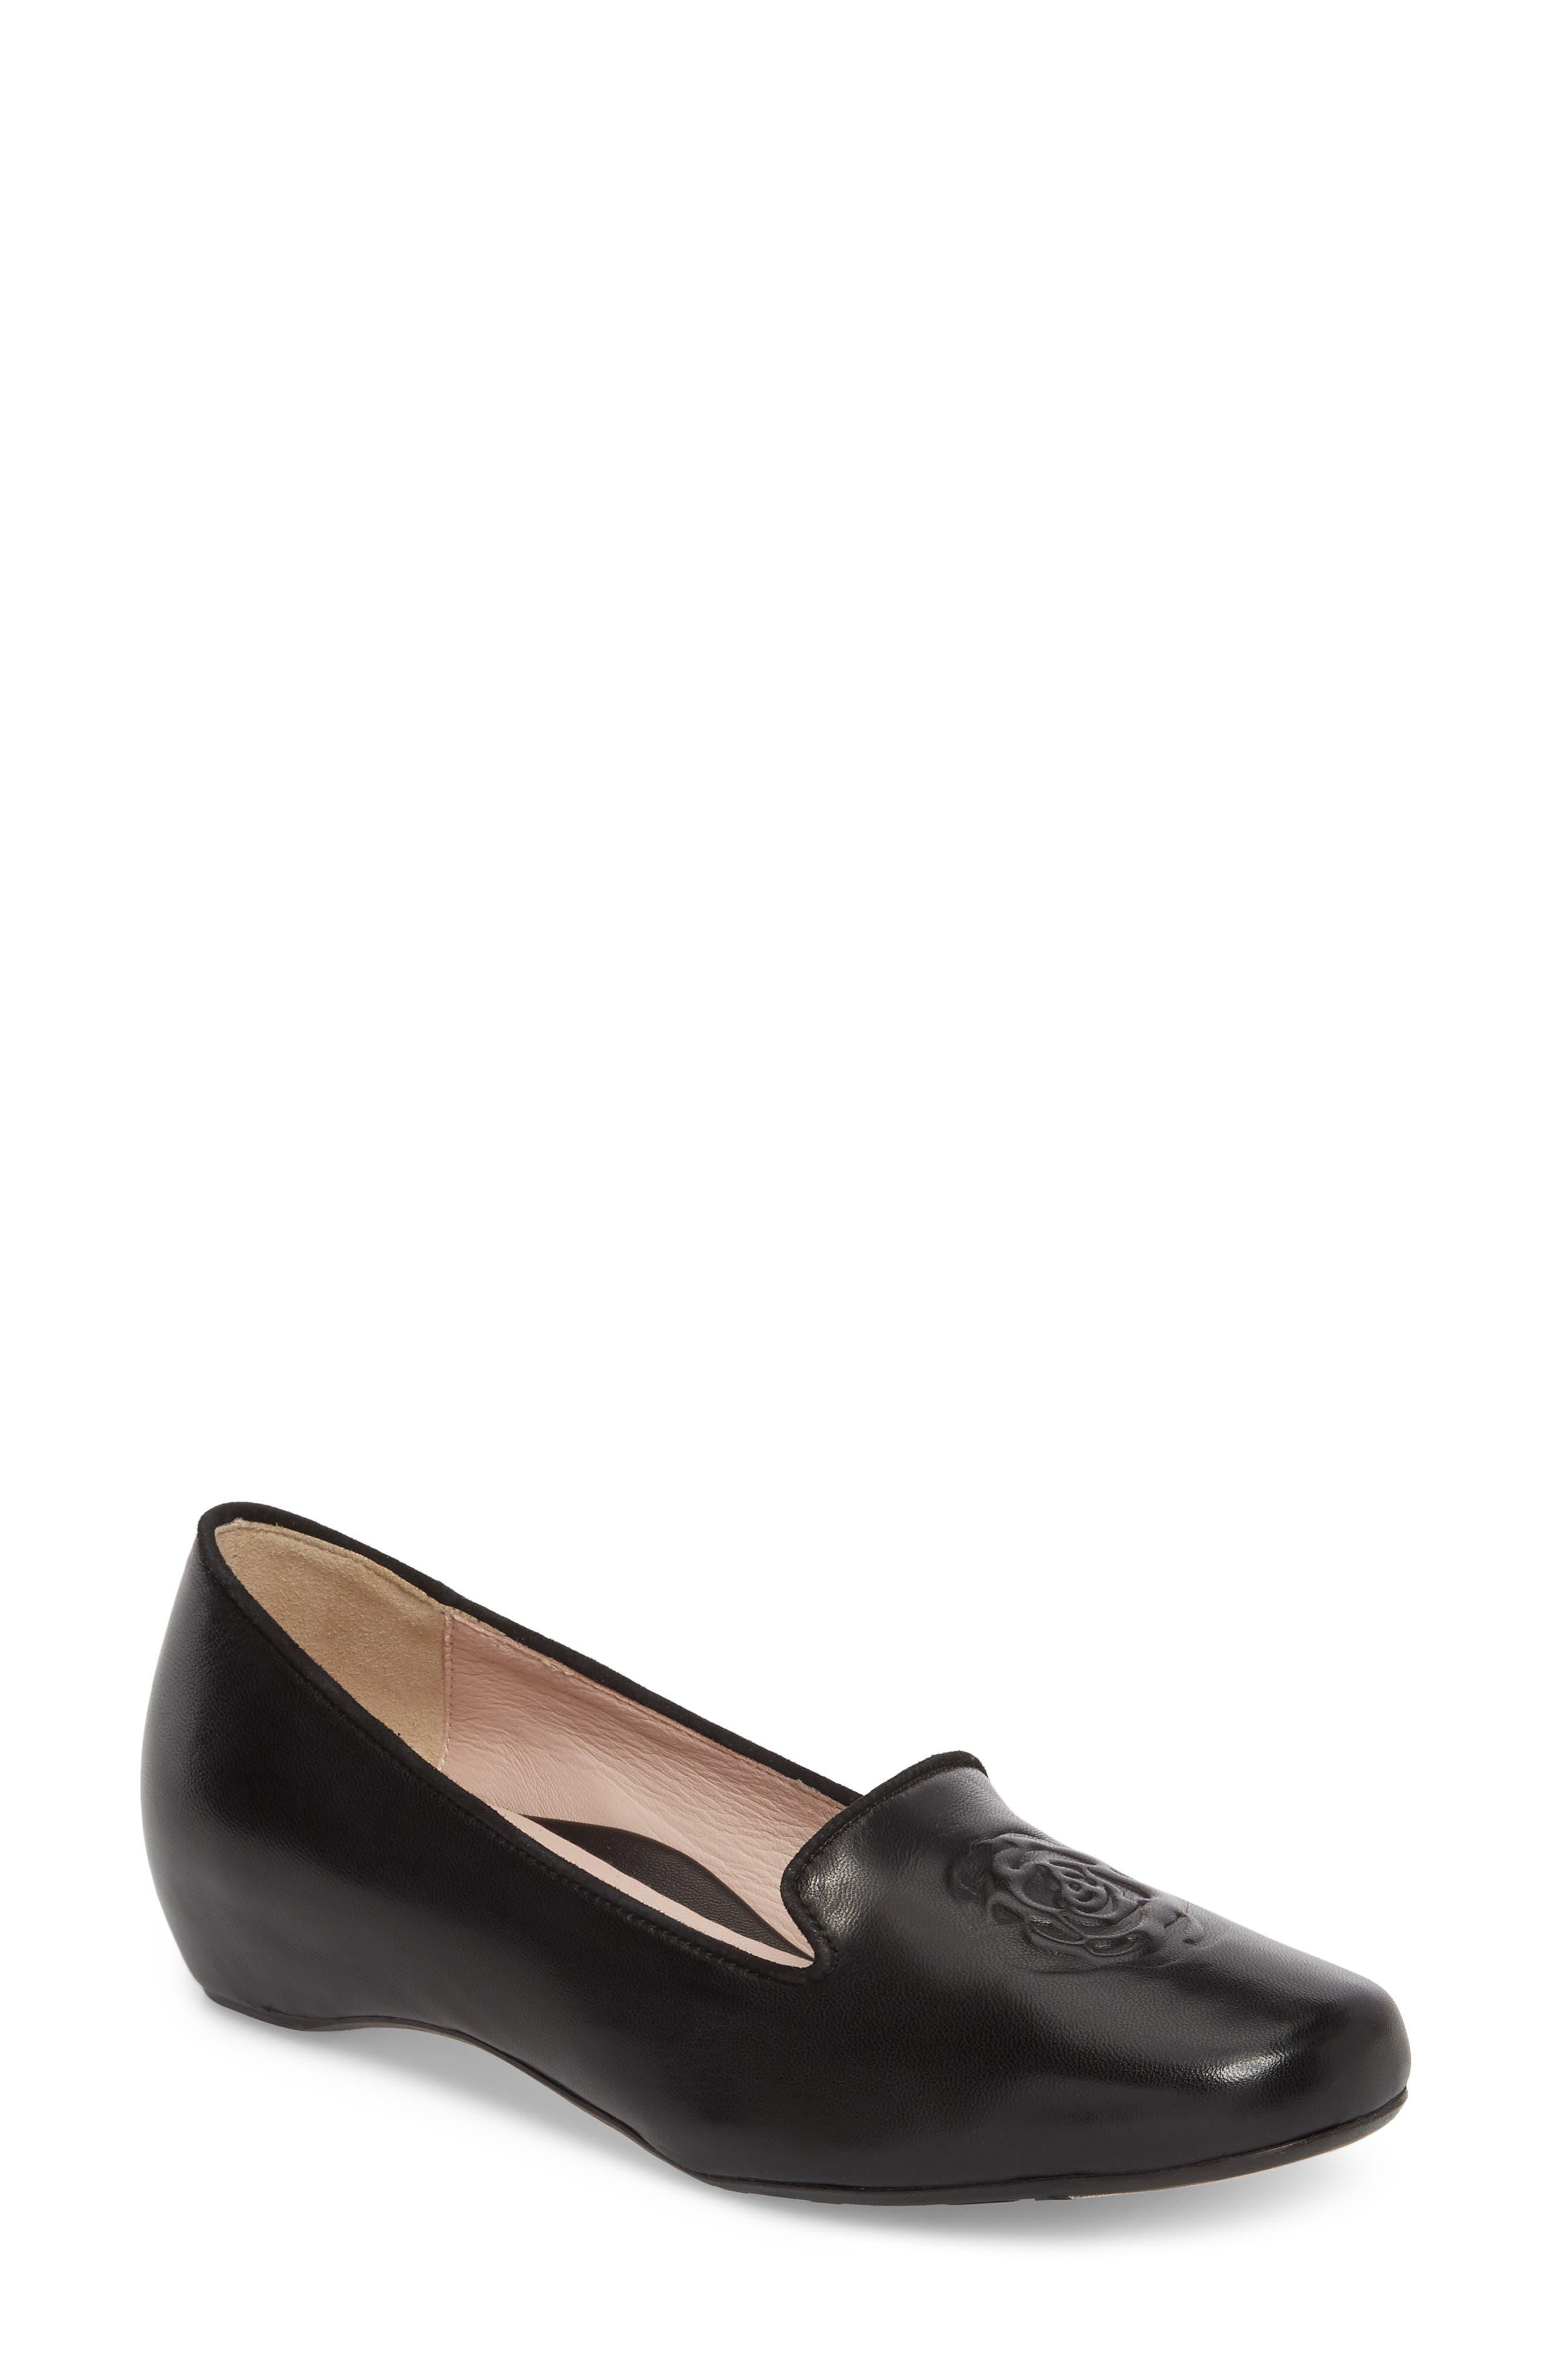 Taryn Rose Belissa Loafer,                             Main thumbnail 1, color,                             Black Leather